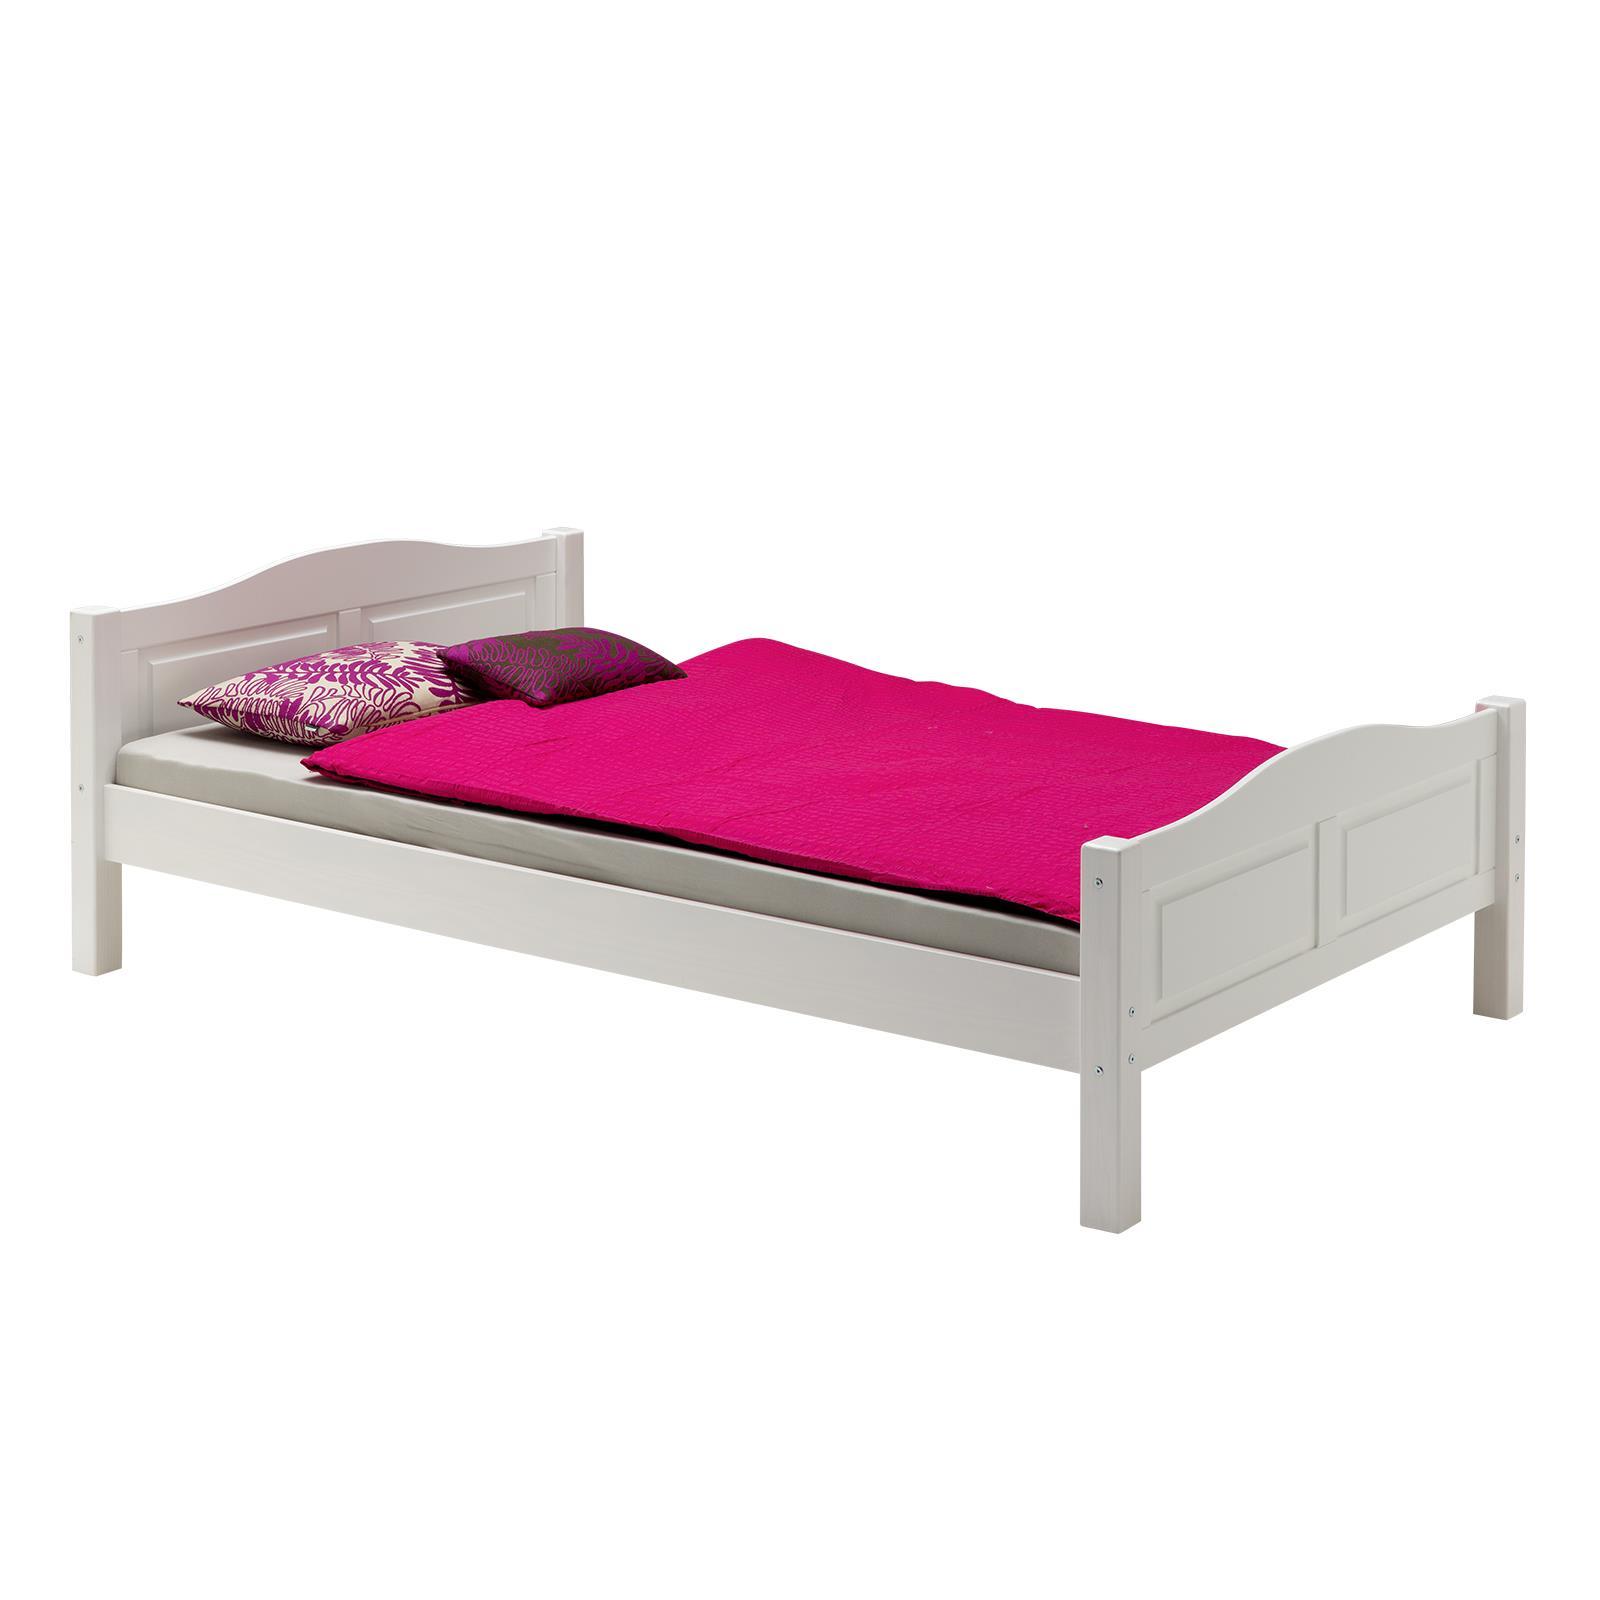 bett landhausbett henrik 120x200 cm wei mobilia24. Black Bedroom Furniture Sets. Home Design Ideas